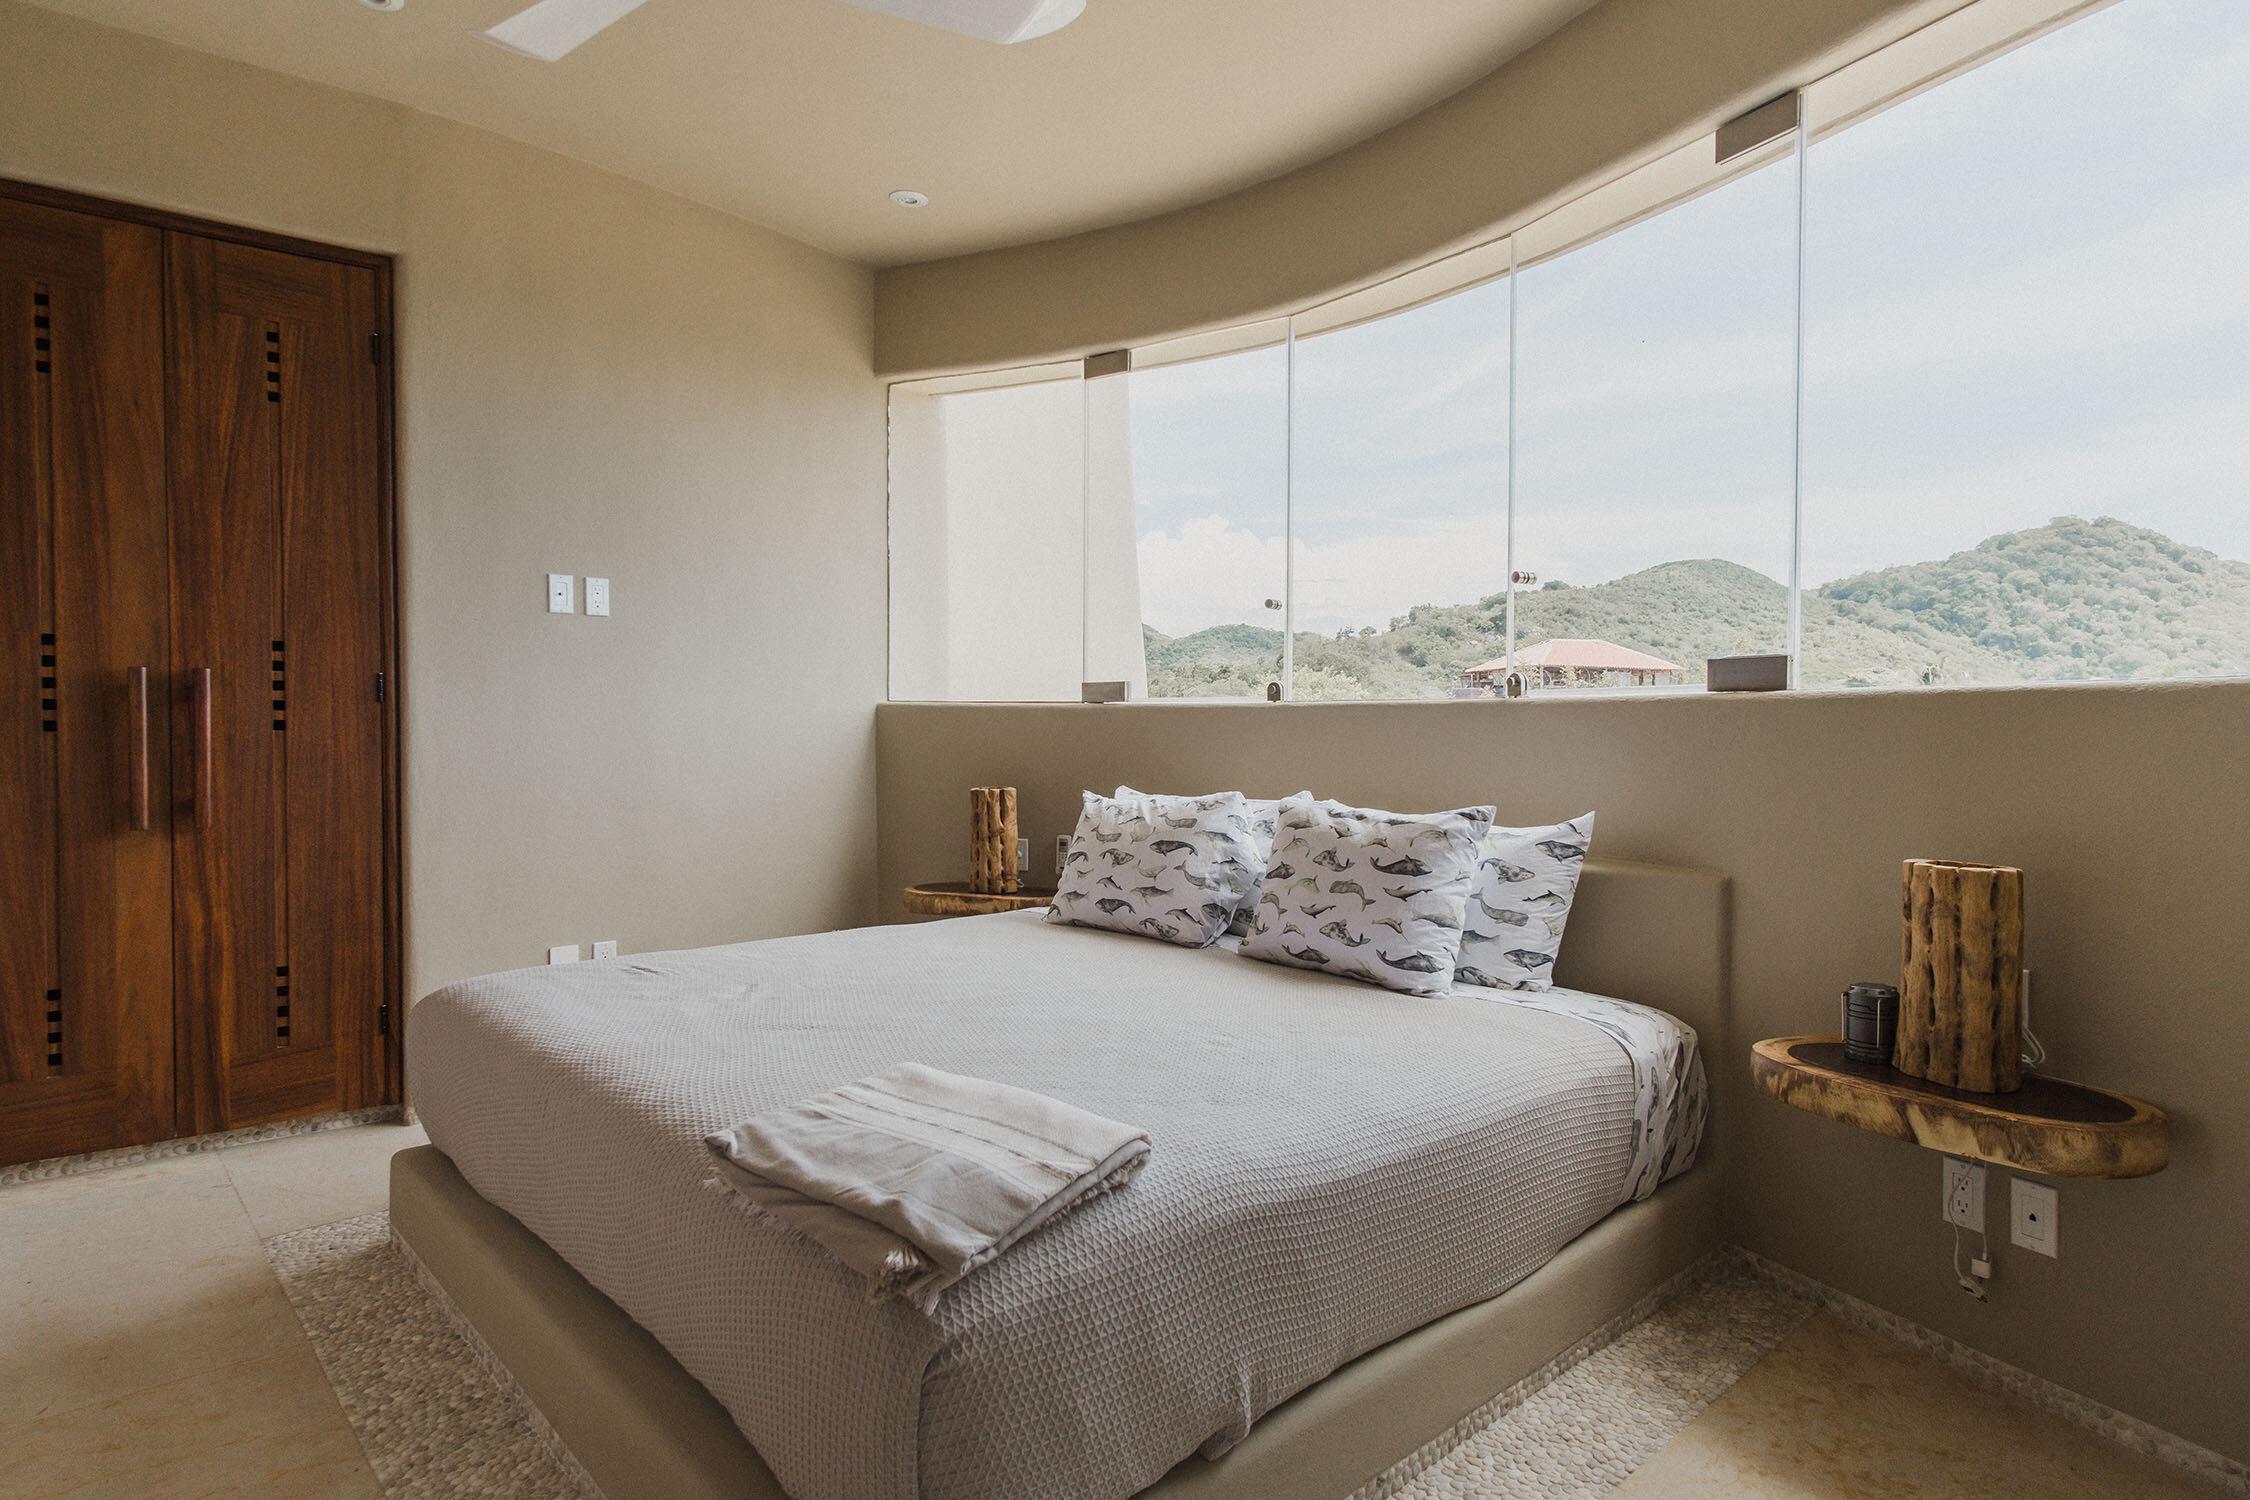 Punta-Majahua-Troncones-Ixtapa-Zihuatanejo-Zozaya-Arquitectos-Fotografia-Heiko-Bothe-16.jpg